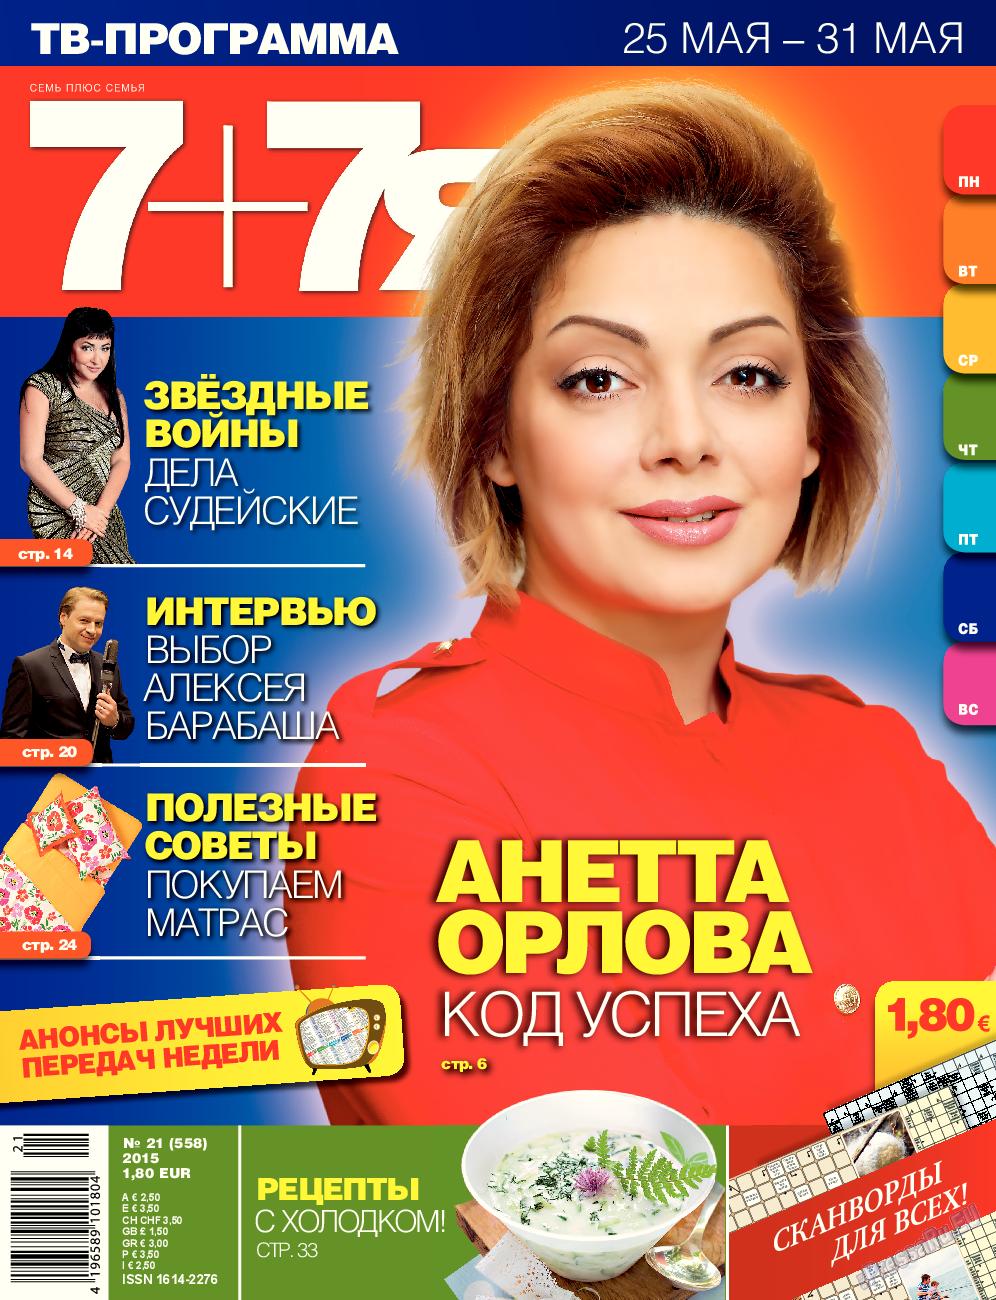 7плюс7я (журнал). 2015 год, номер 21, стр. 1